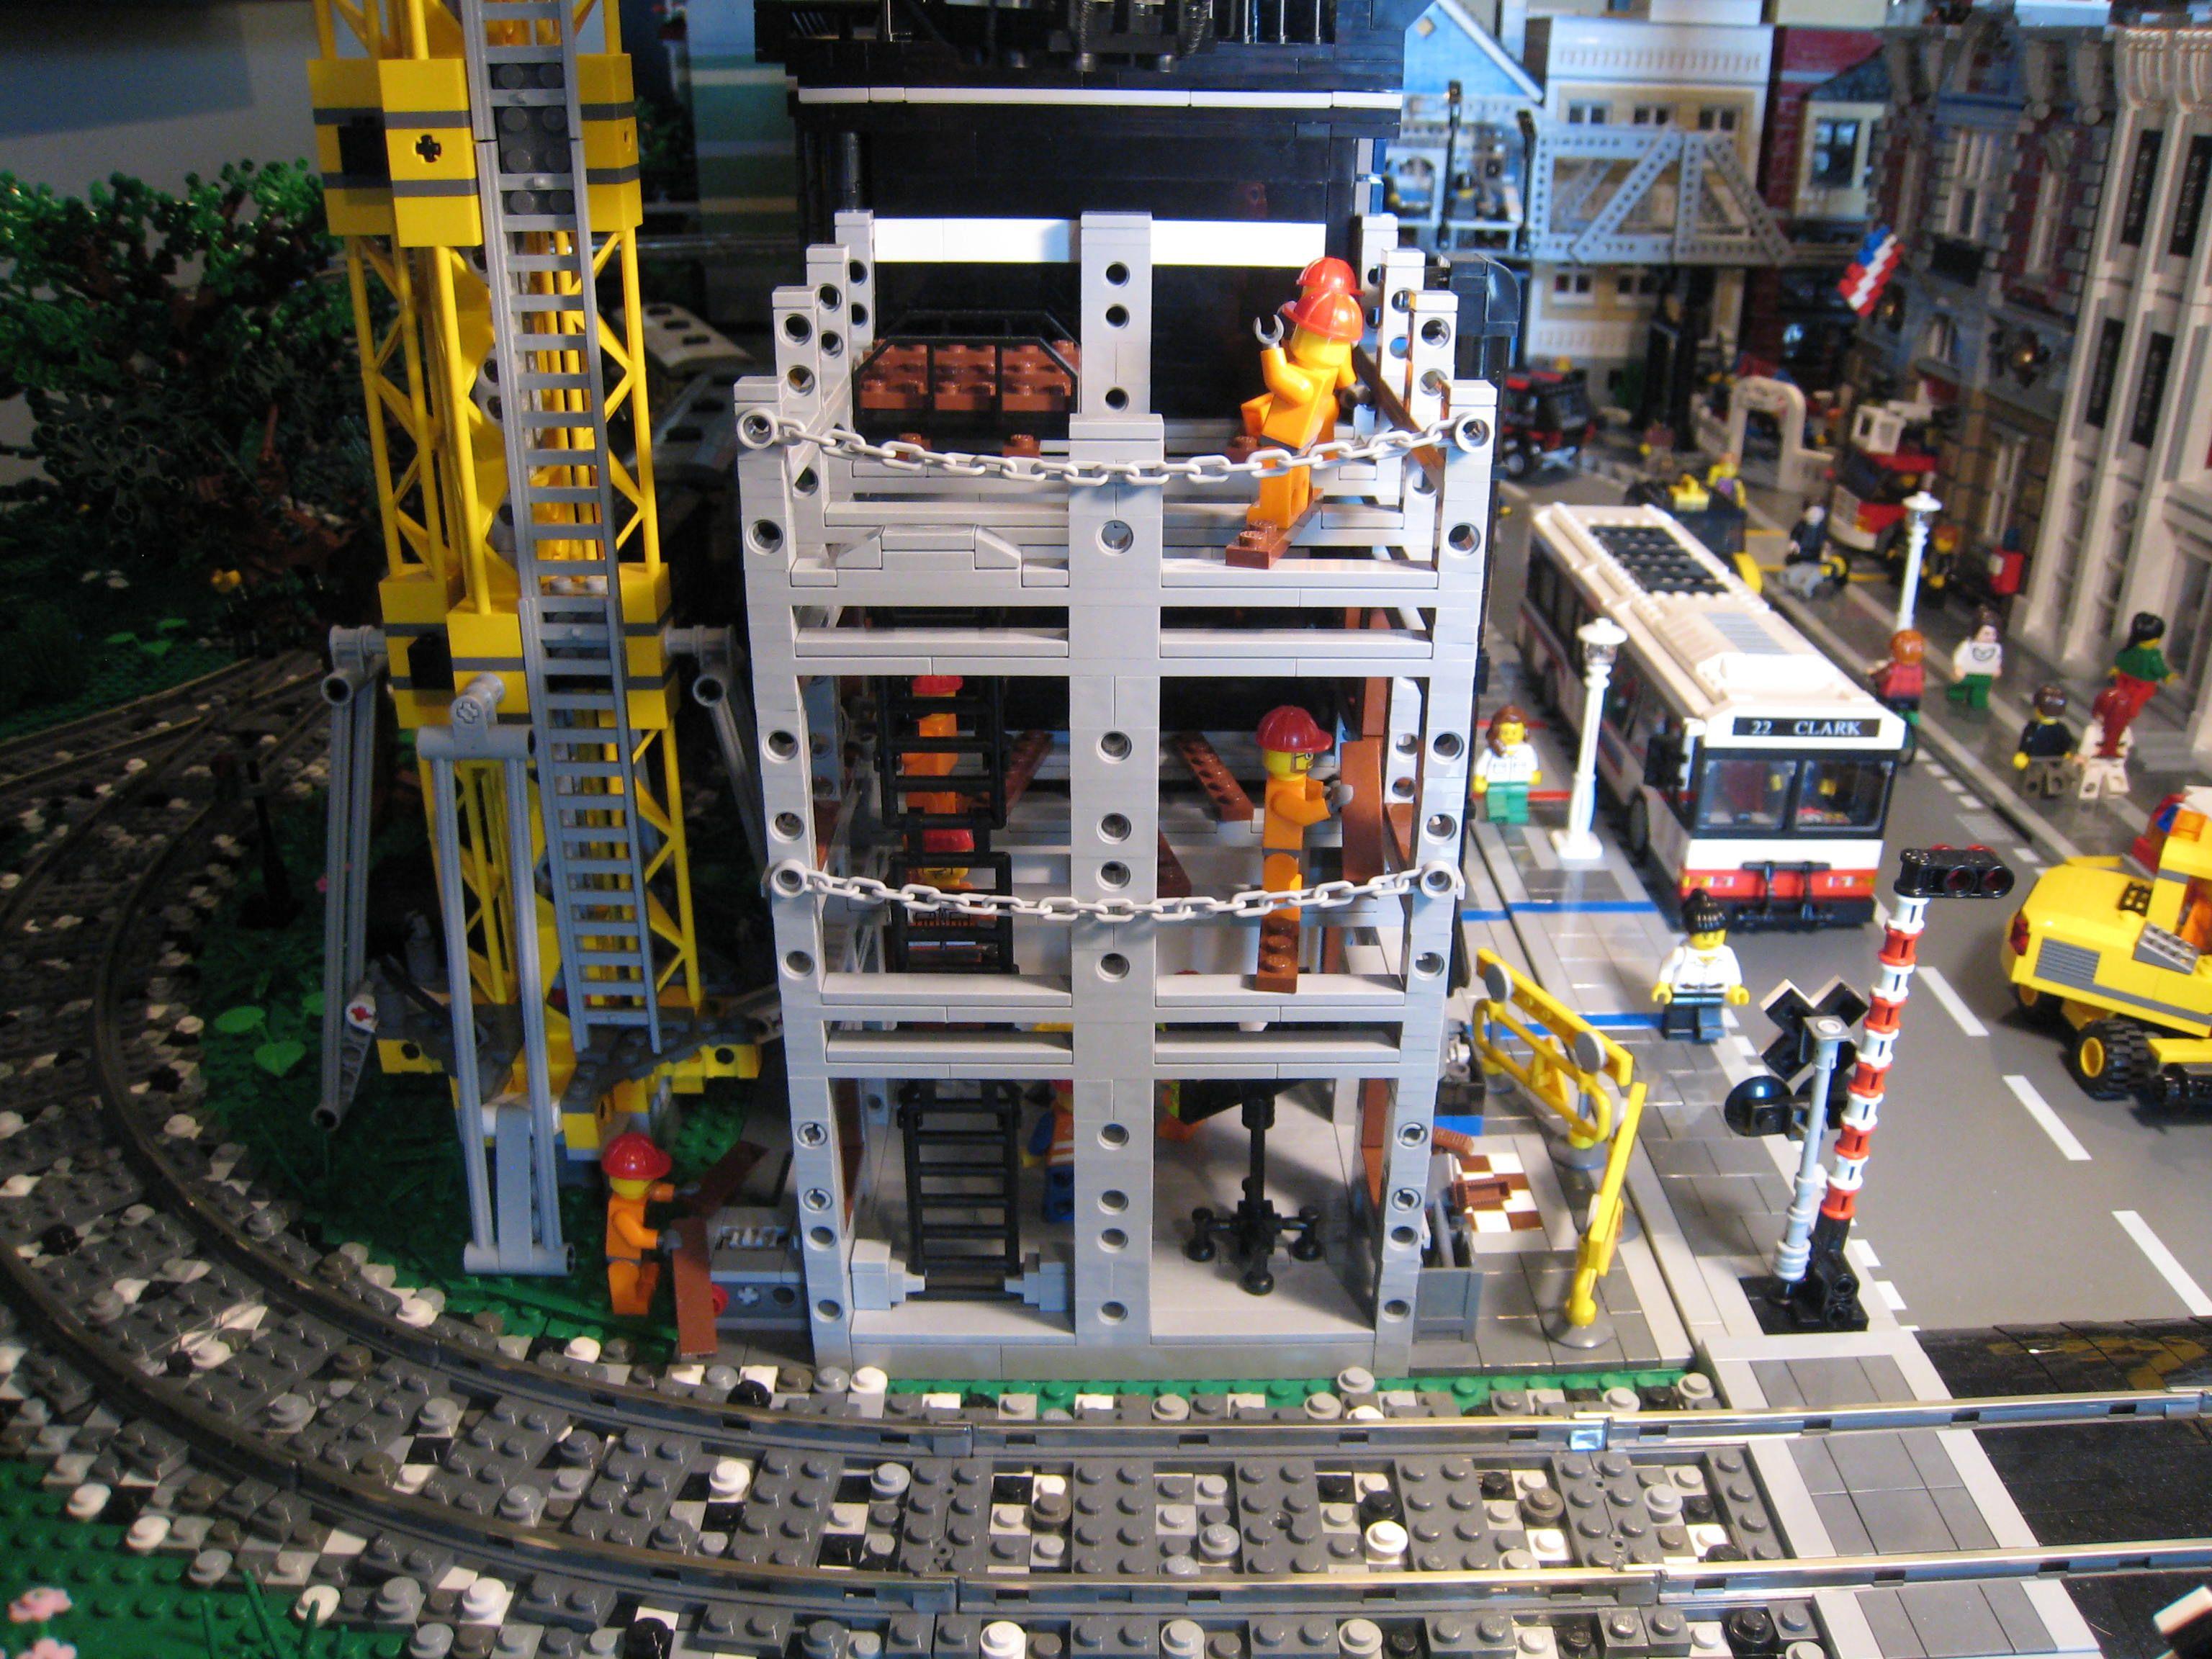 Lego construction site lego pinterest lego ideen for Lego modernes haus